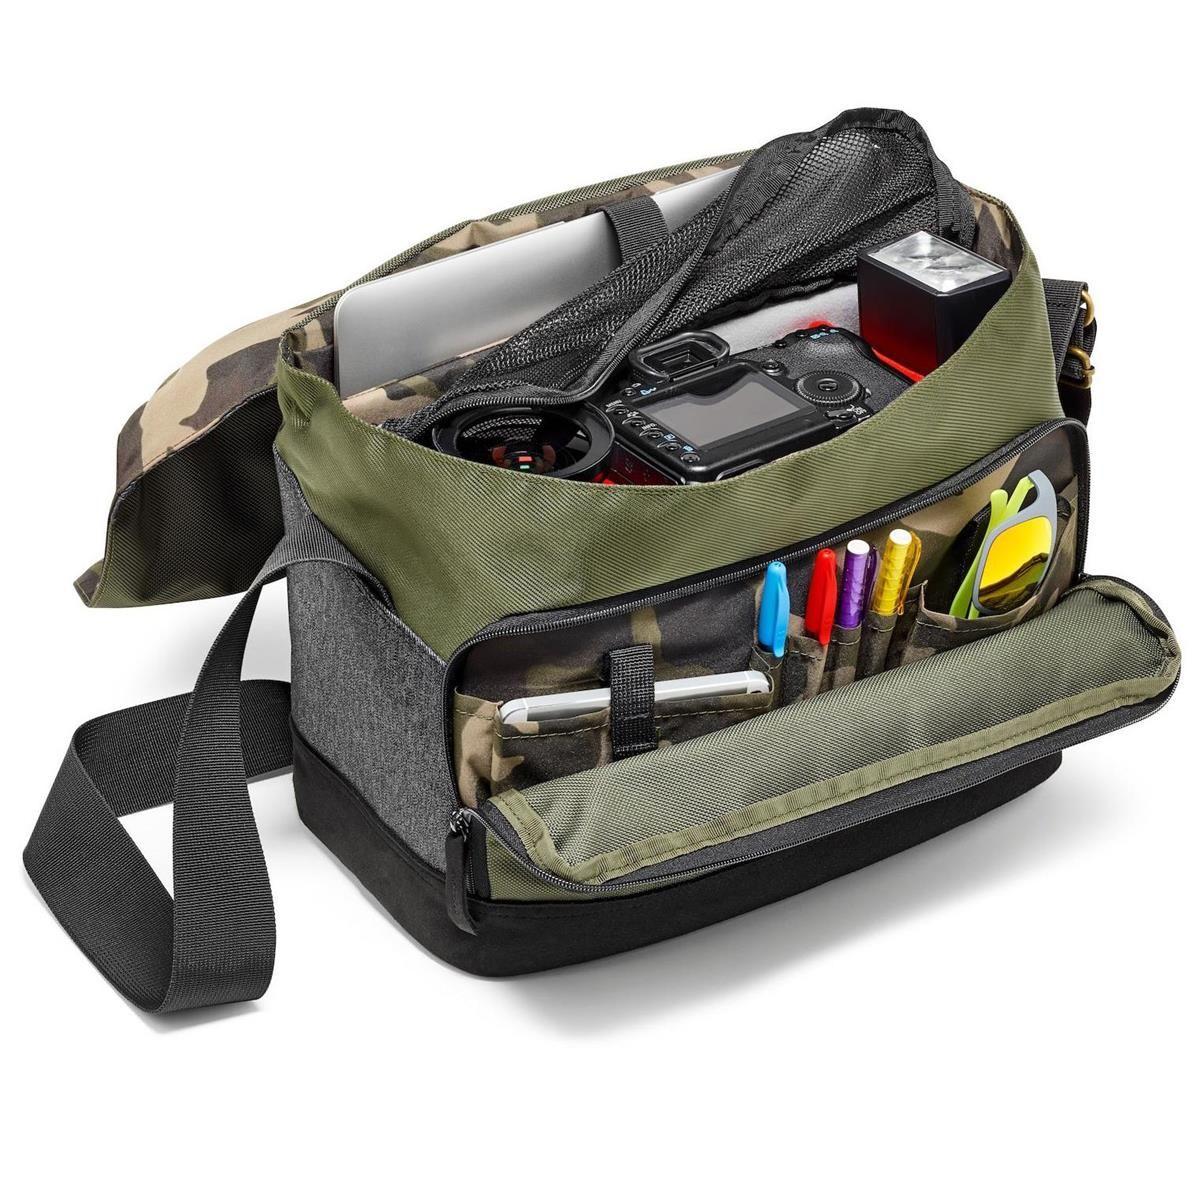 61786c25e3 Manfrotto Street Large Messenger Bag for DSLR CSC Cameras